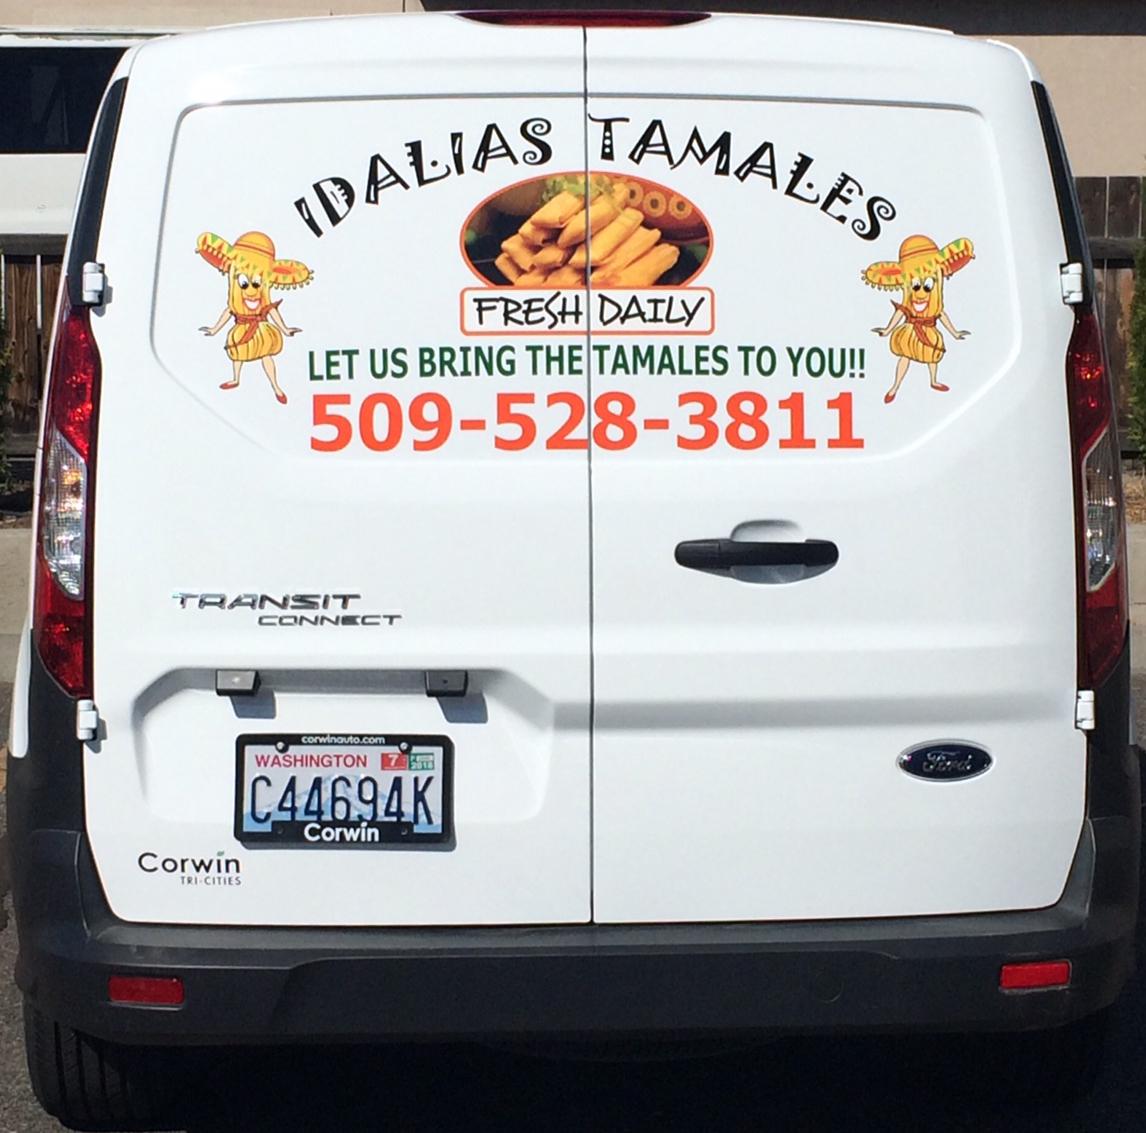 Idalias Tamales Rear.jpg